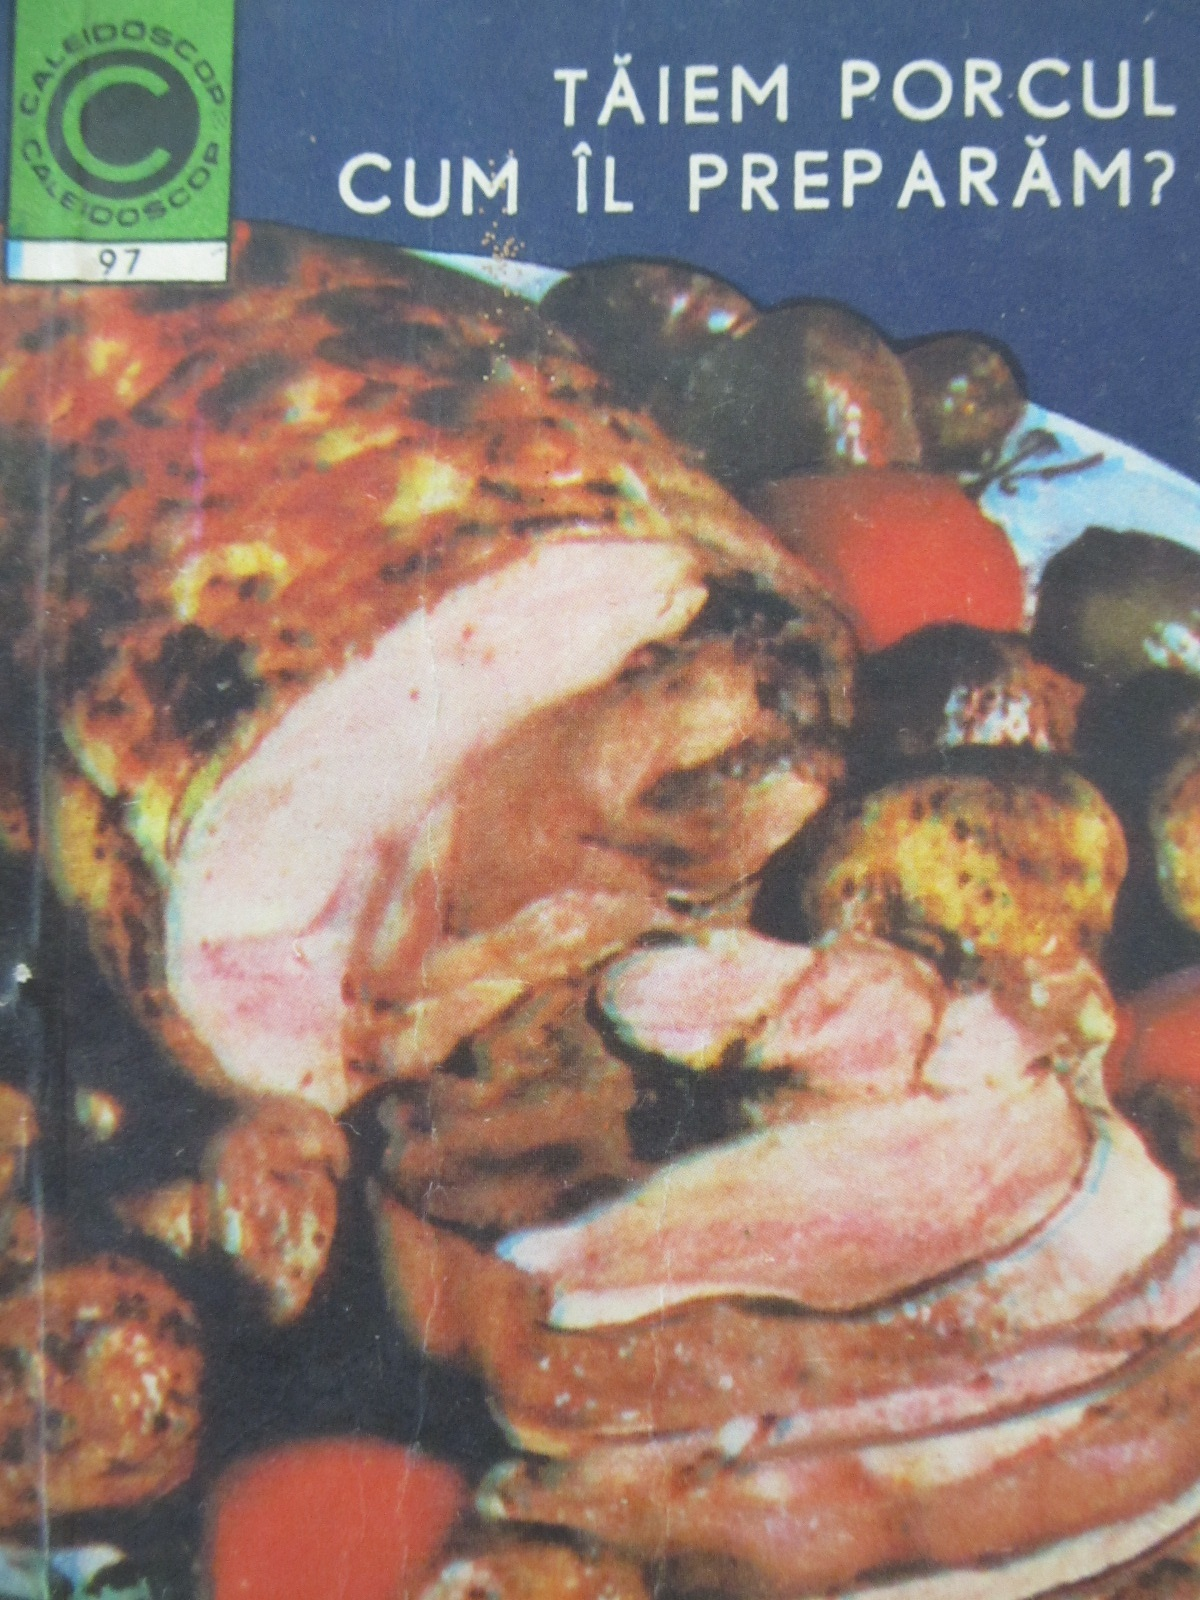 Taiem porcul cum il preparam ? (97) - Viorel Suciu , Gheorghe Szekely | Detalii carte